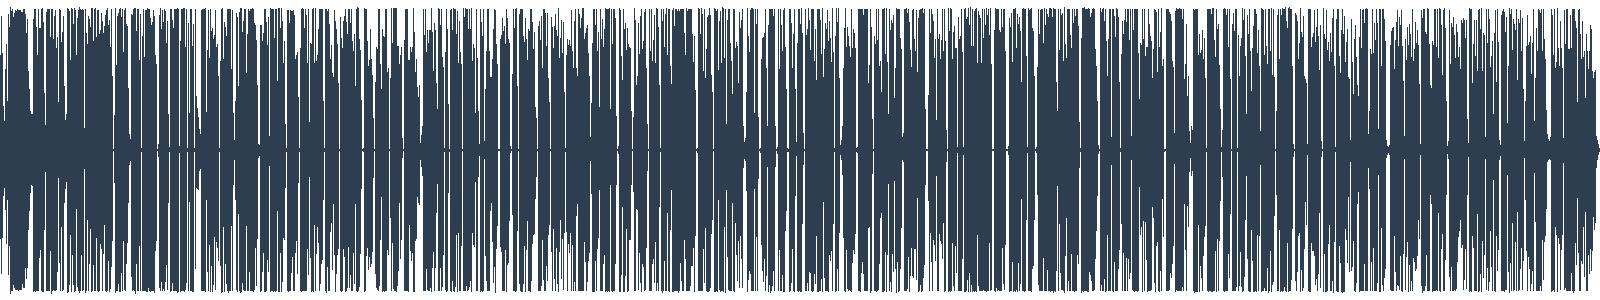 #25 Literárne smery po roku 1945 (Maturita s Hashtagom) waveform